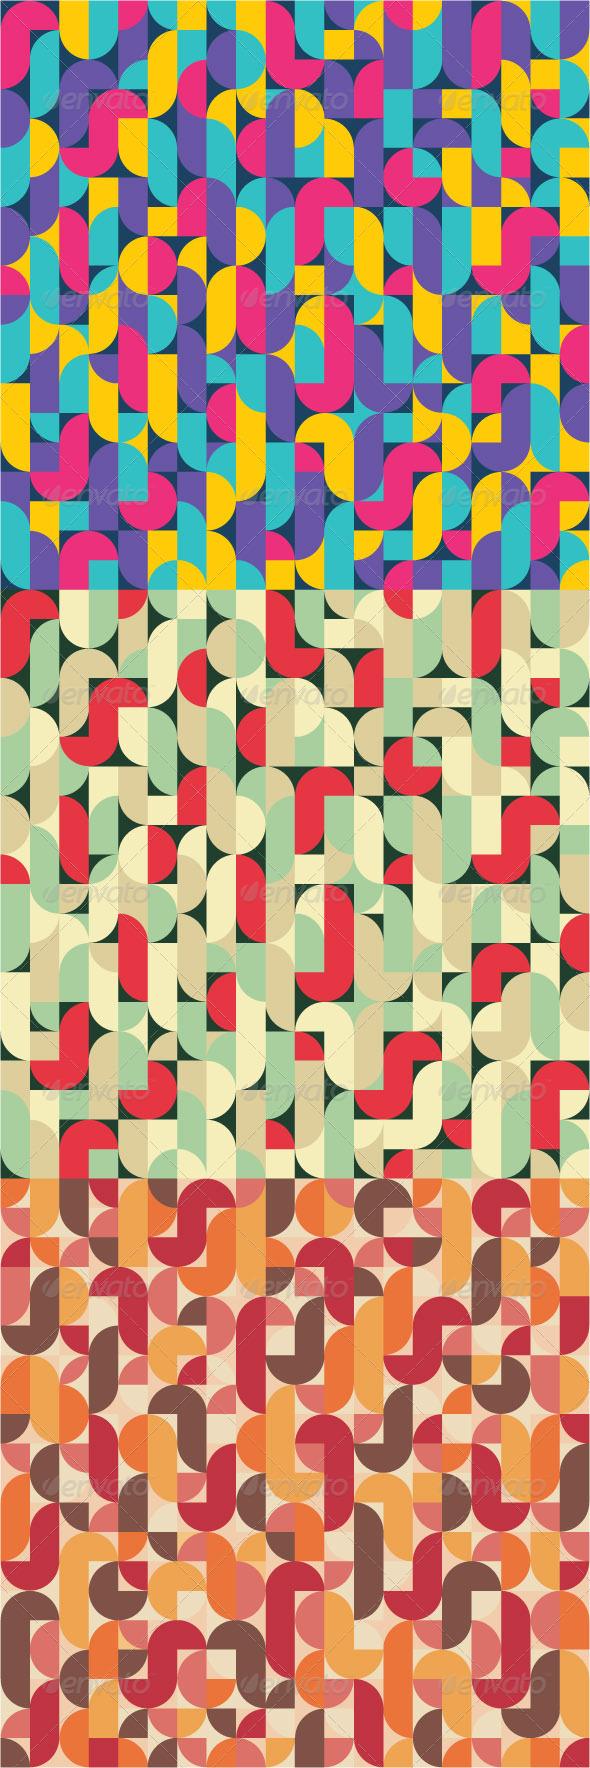 GraphicRiver Geometric Seamless Background 03 4494493